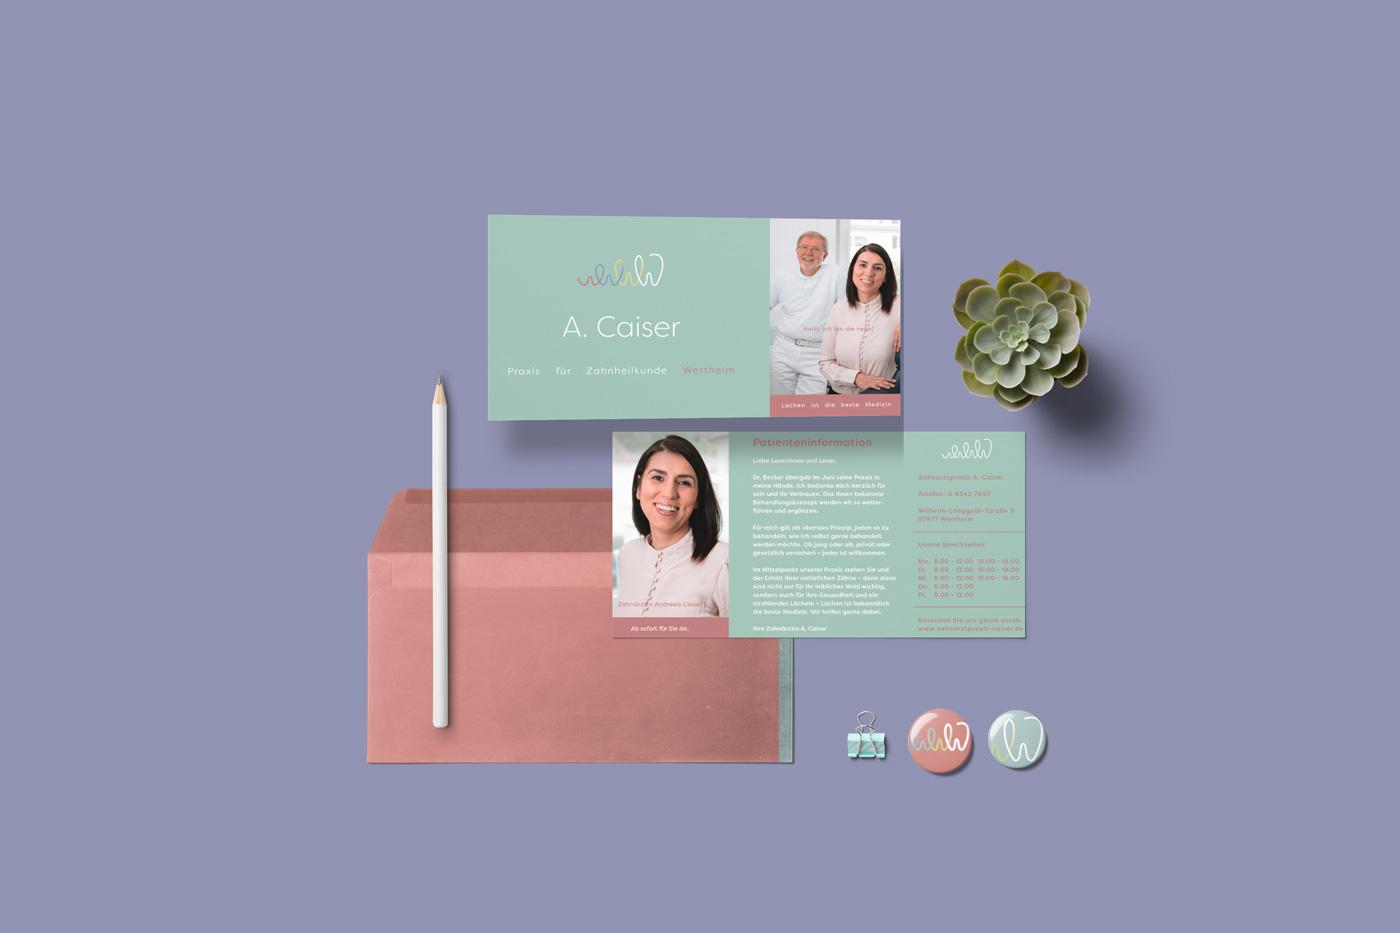 Praxis_Caiser_Branding_Corporate_Identity_Recall-card_Zahnarzt_Design_Studio_Michael-Seidl.jpg